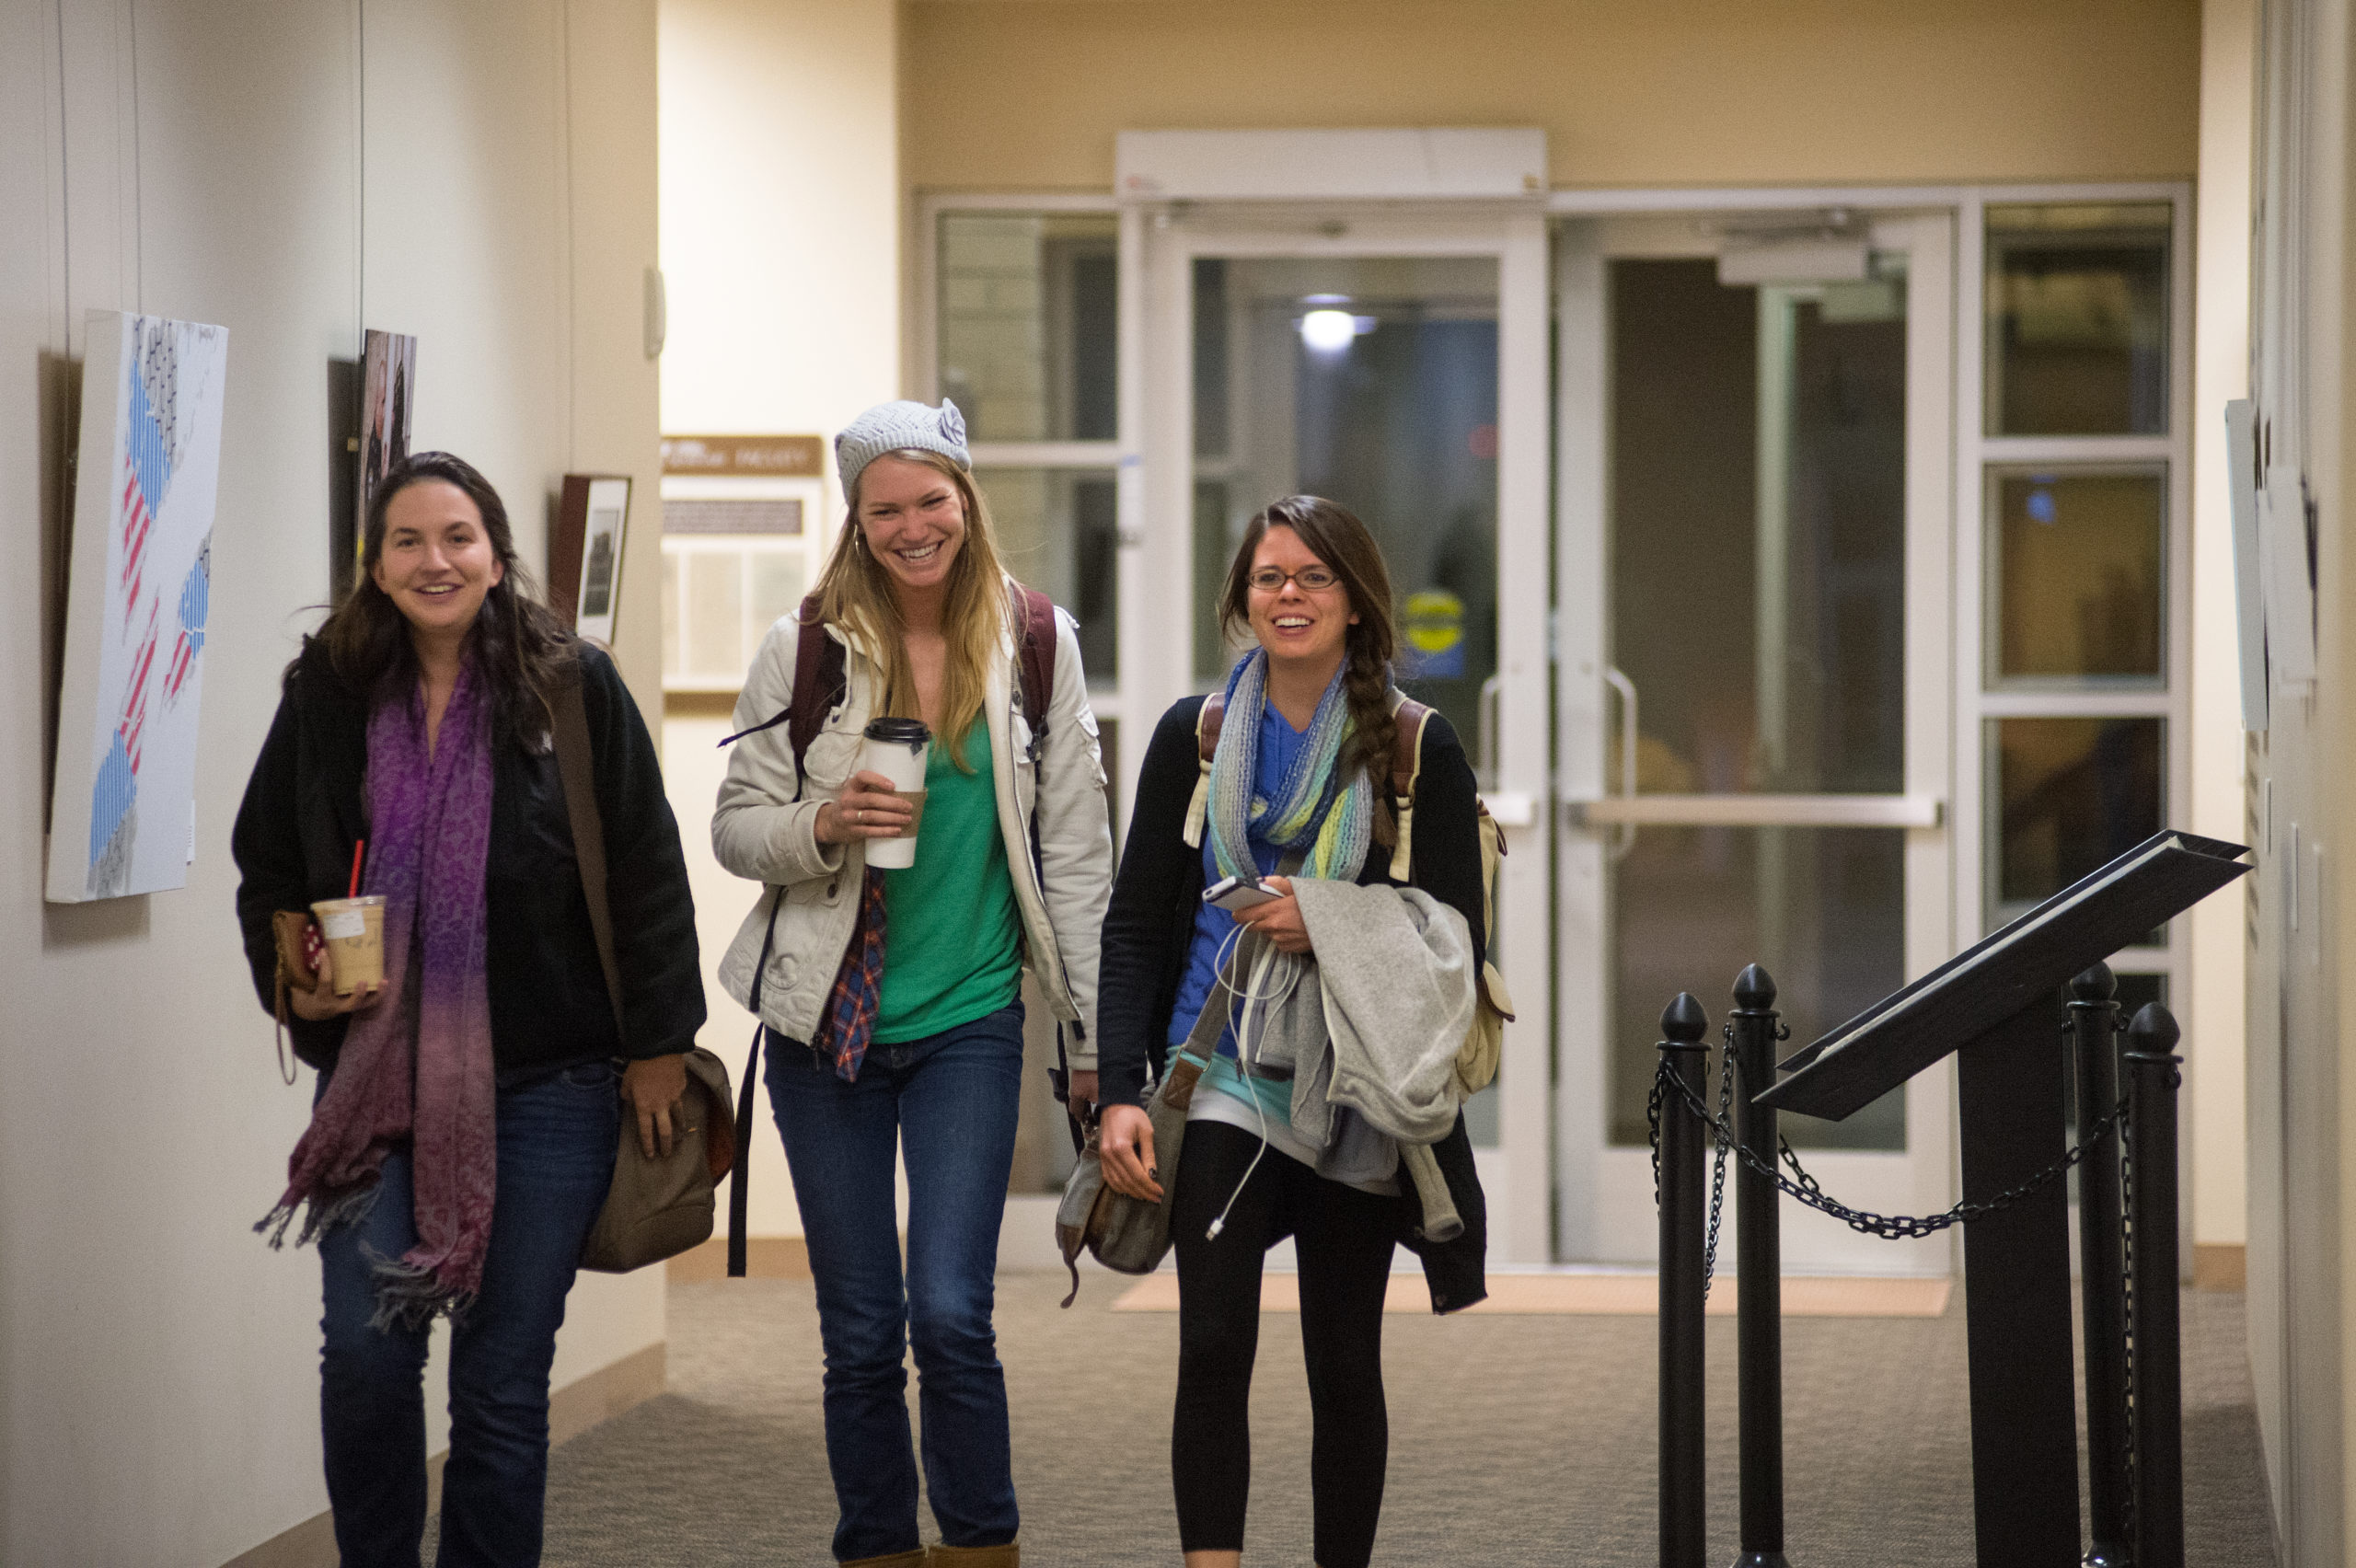 three female students talking in hallway